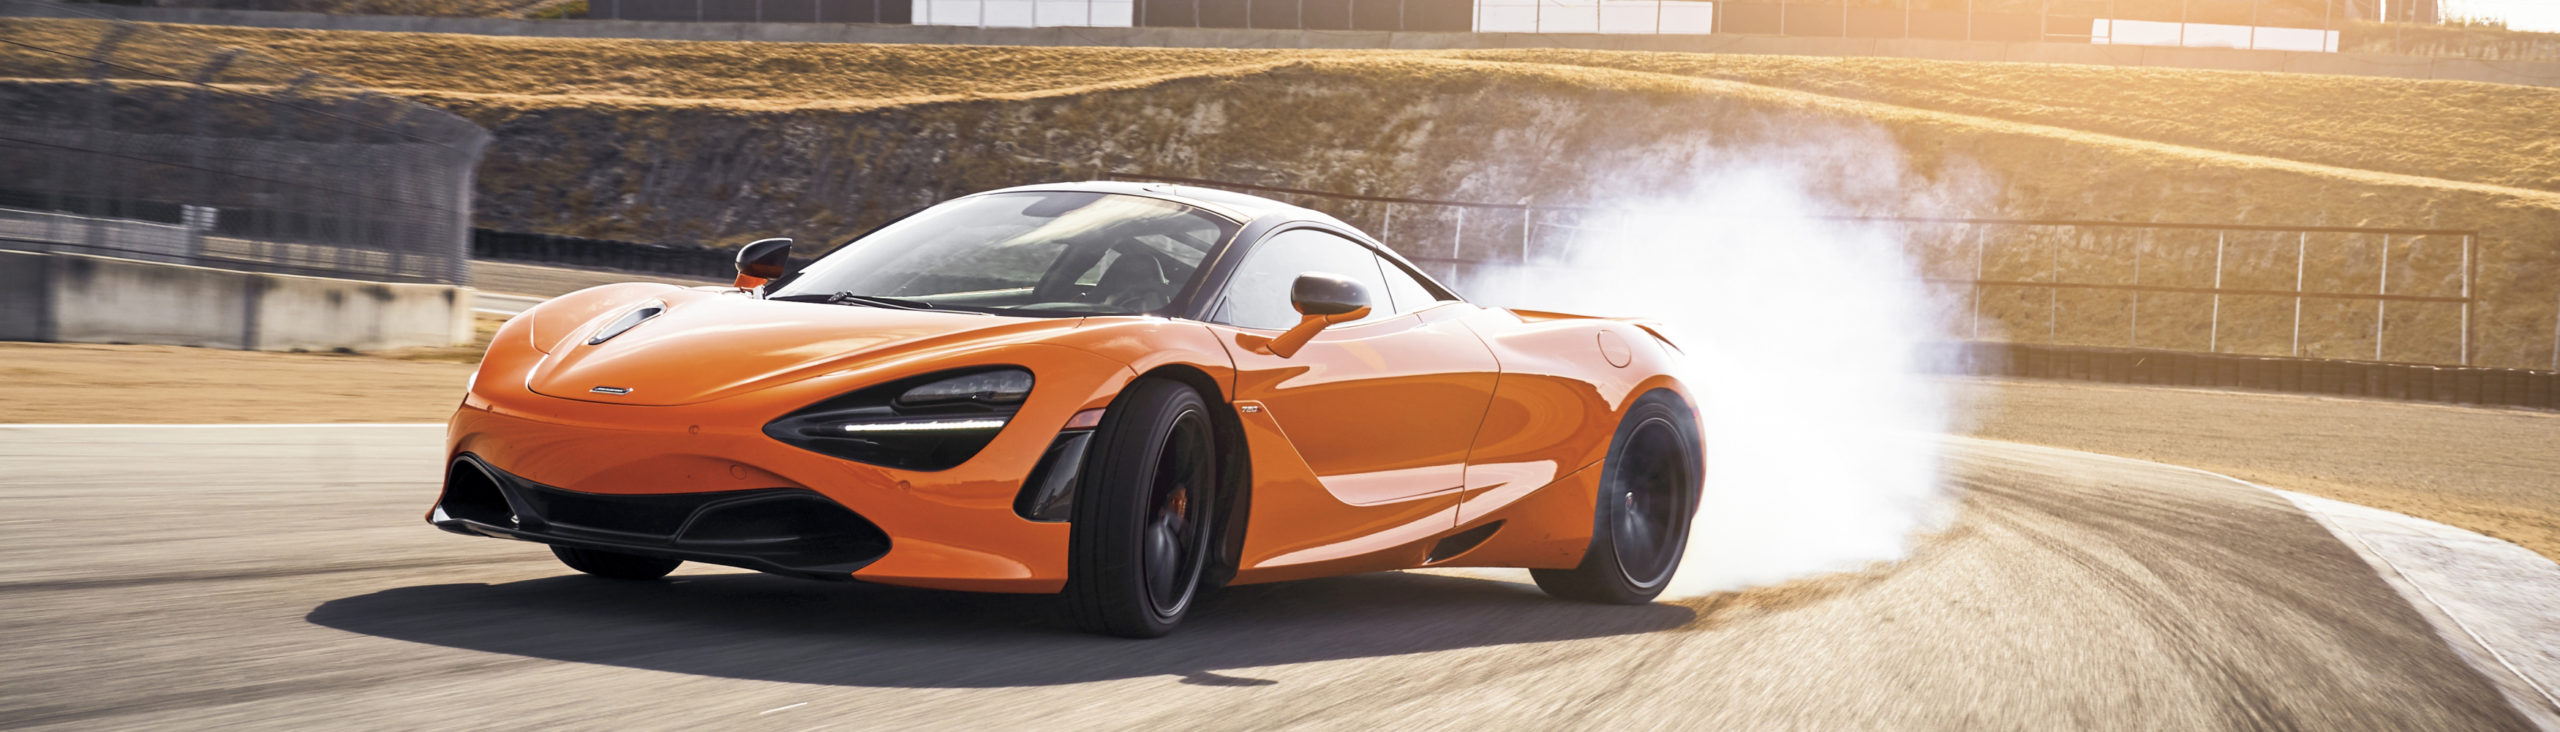 Reasons to Rent a Luxury Car. McLaren Rentals in Charlotte North Carolina.